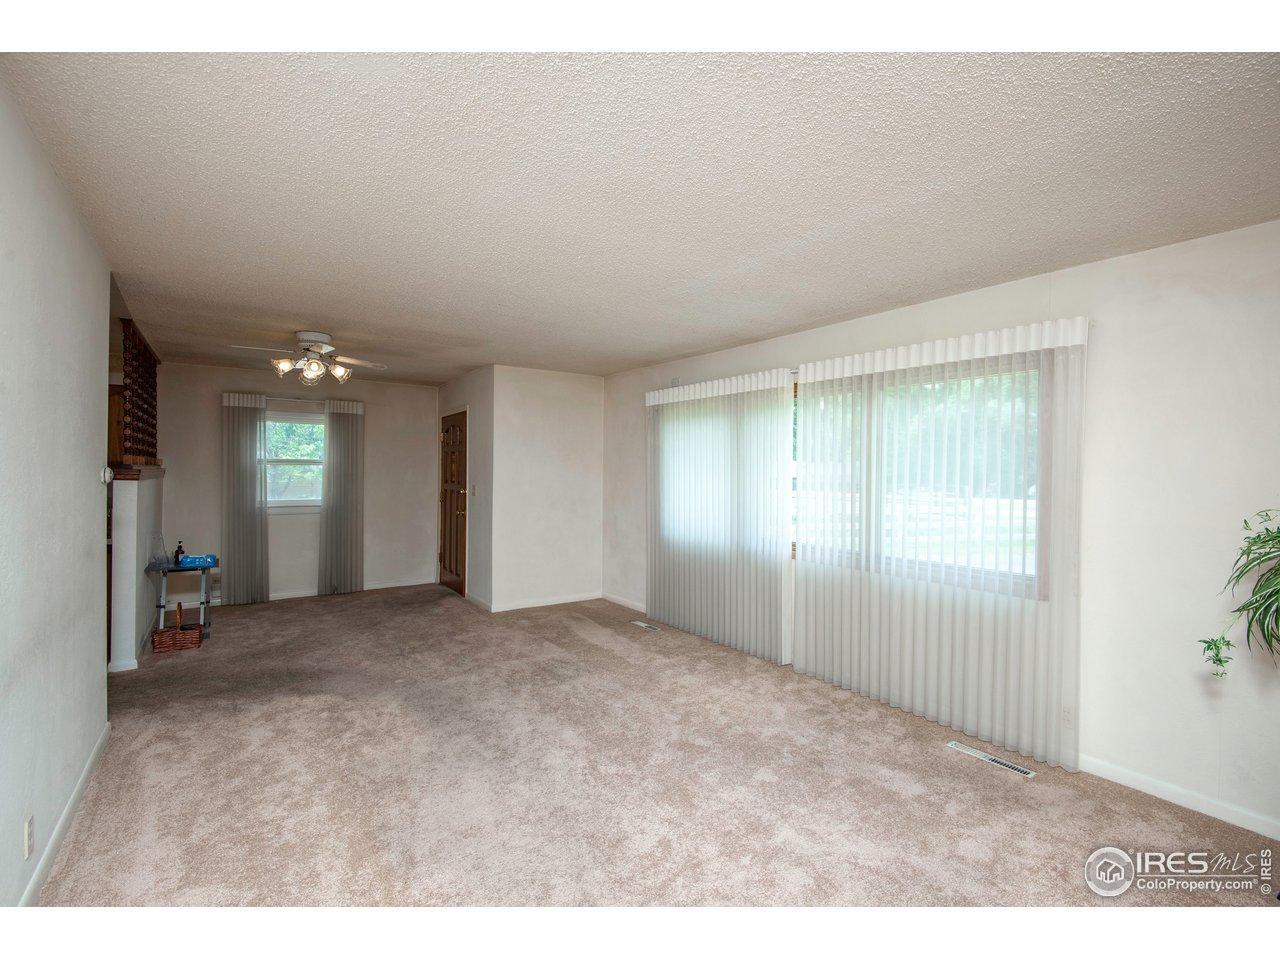 Bright, open living room